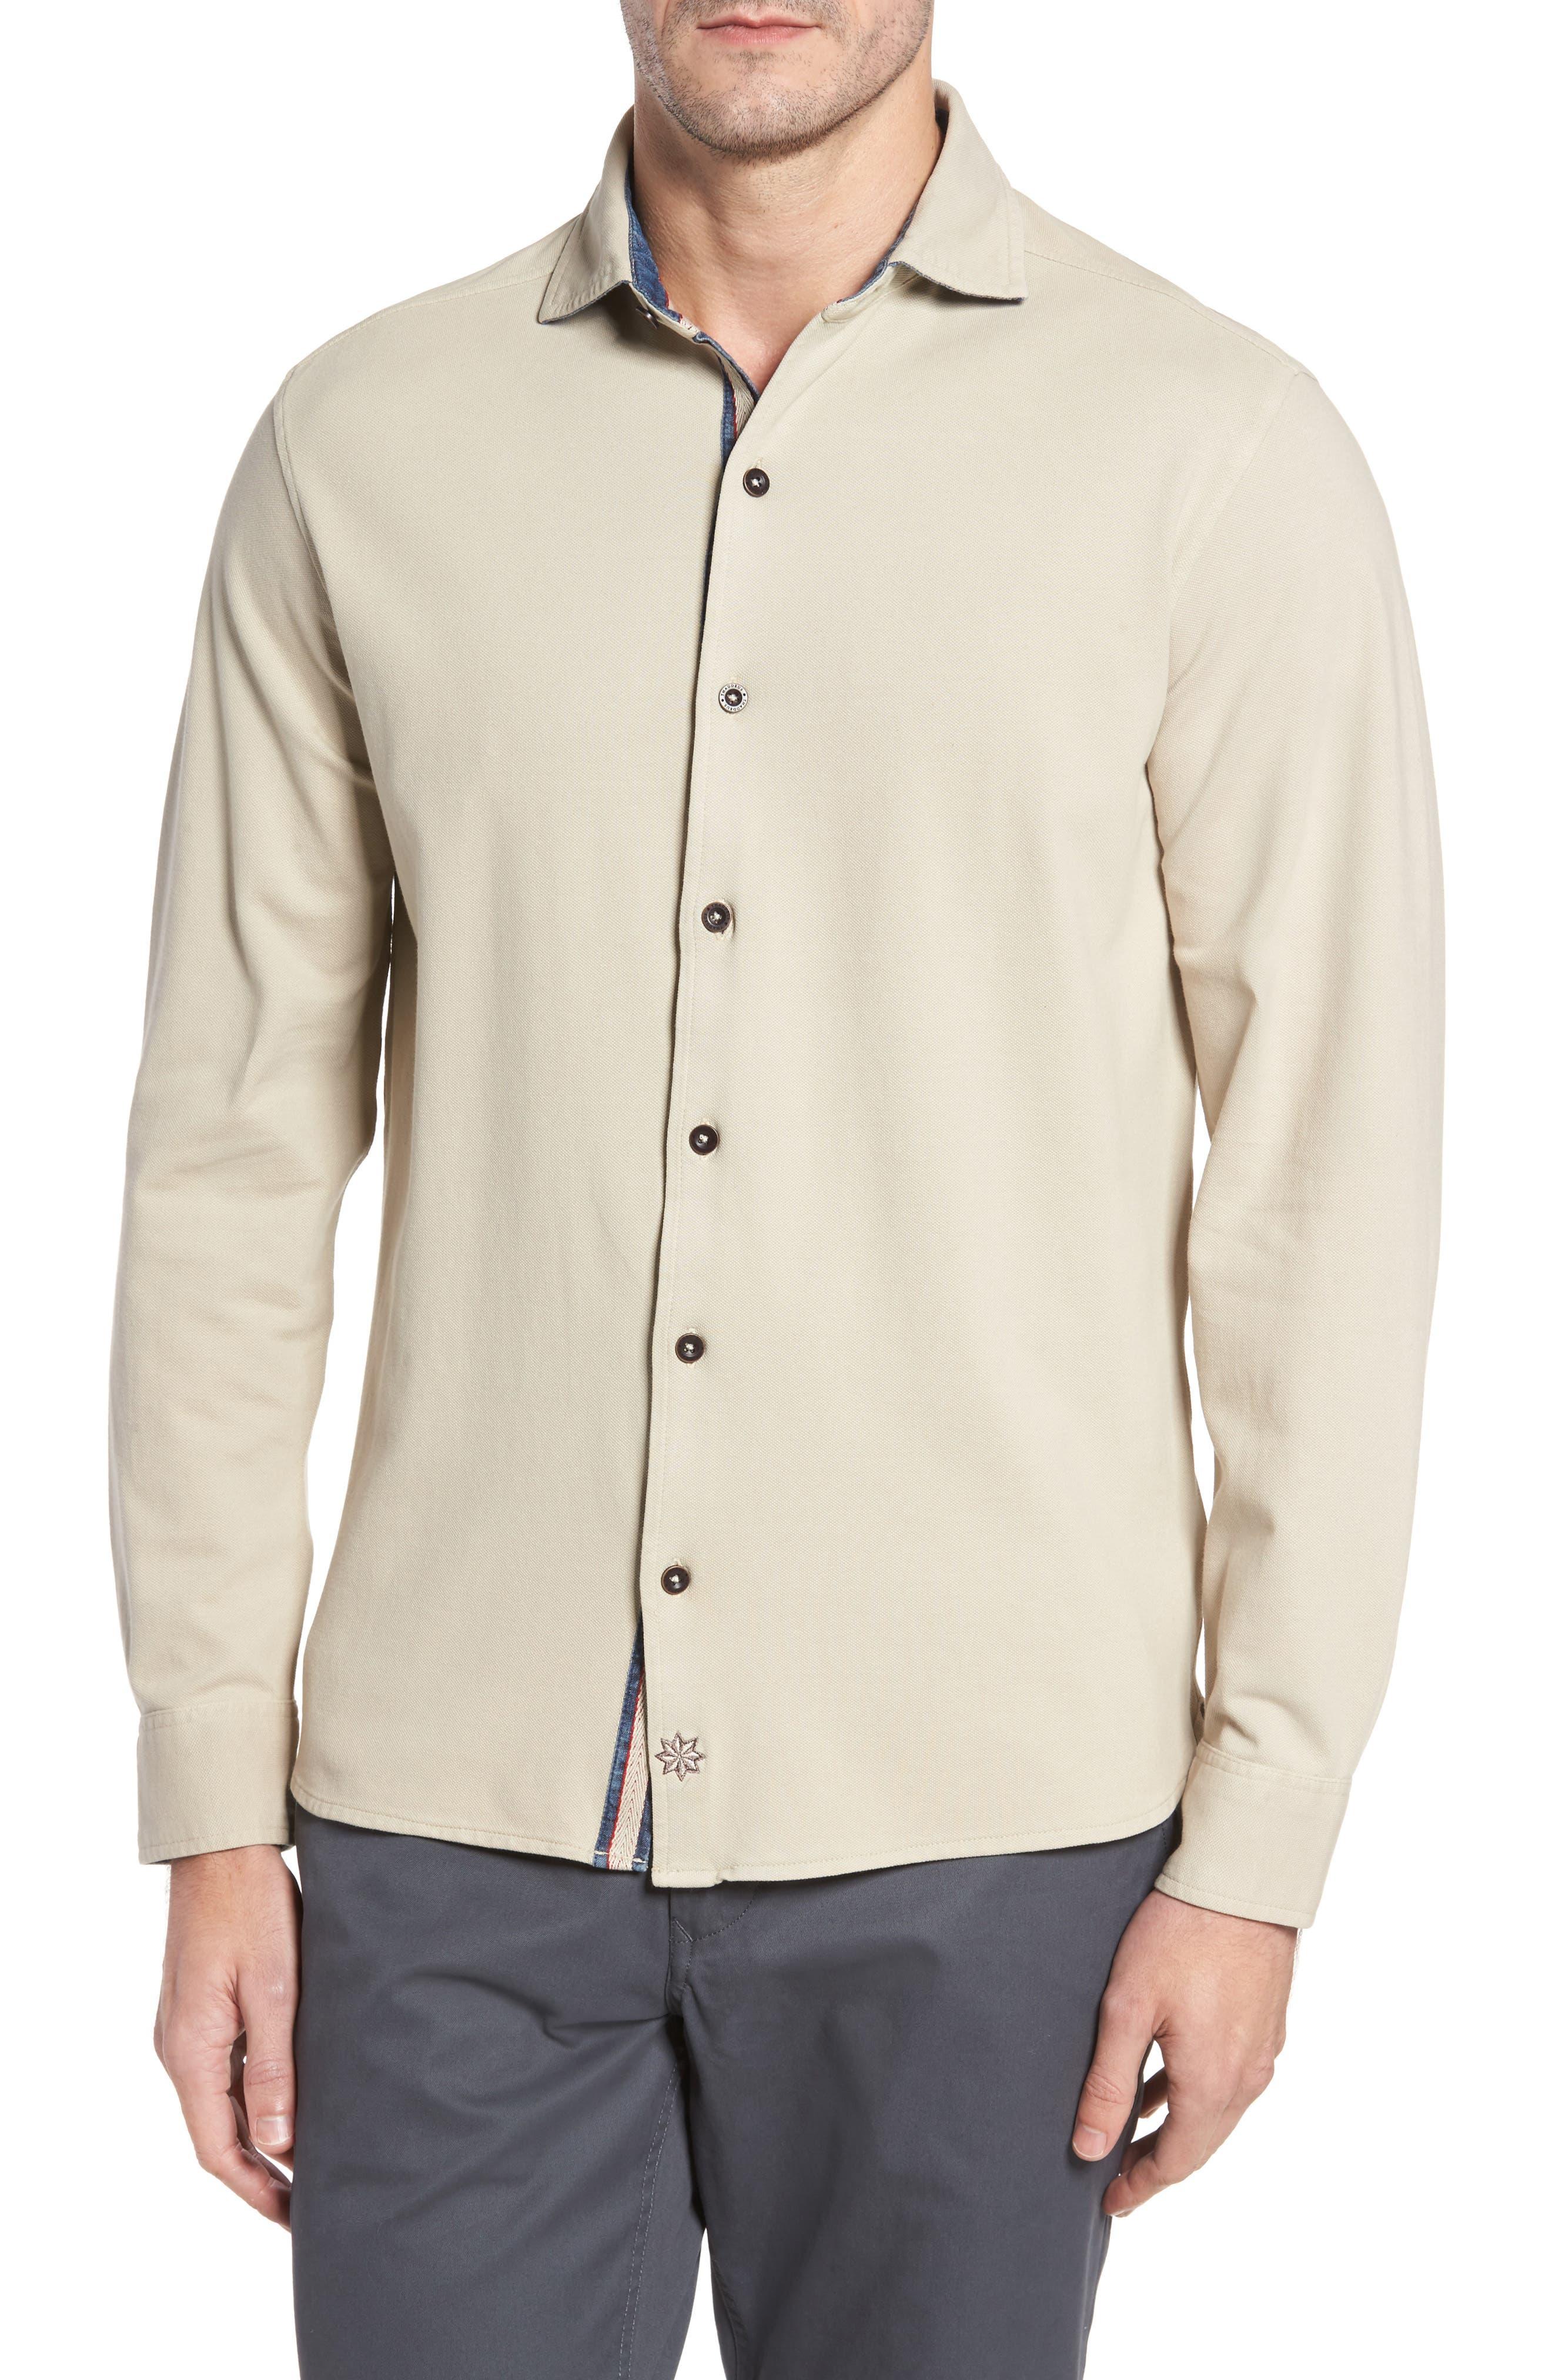 Thaddeus Shively Piqué Knit Sport Shirt